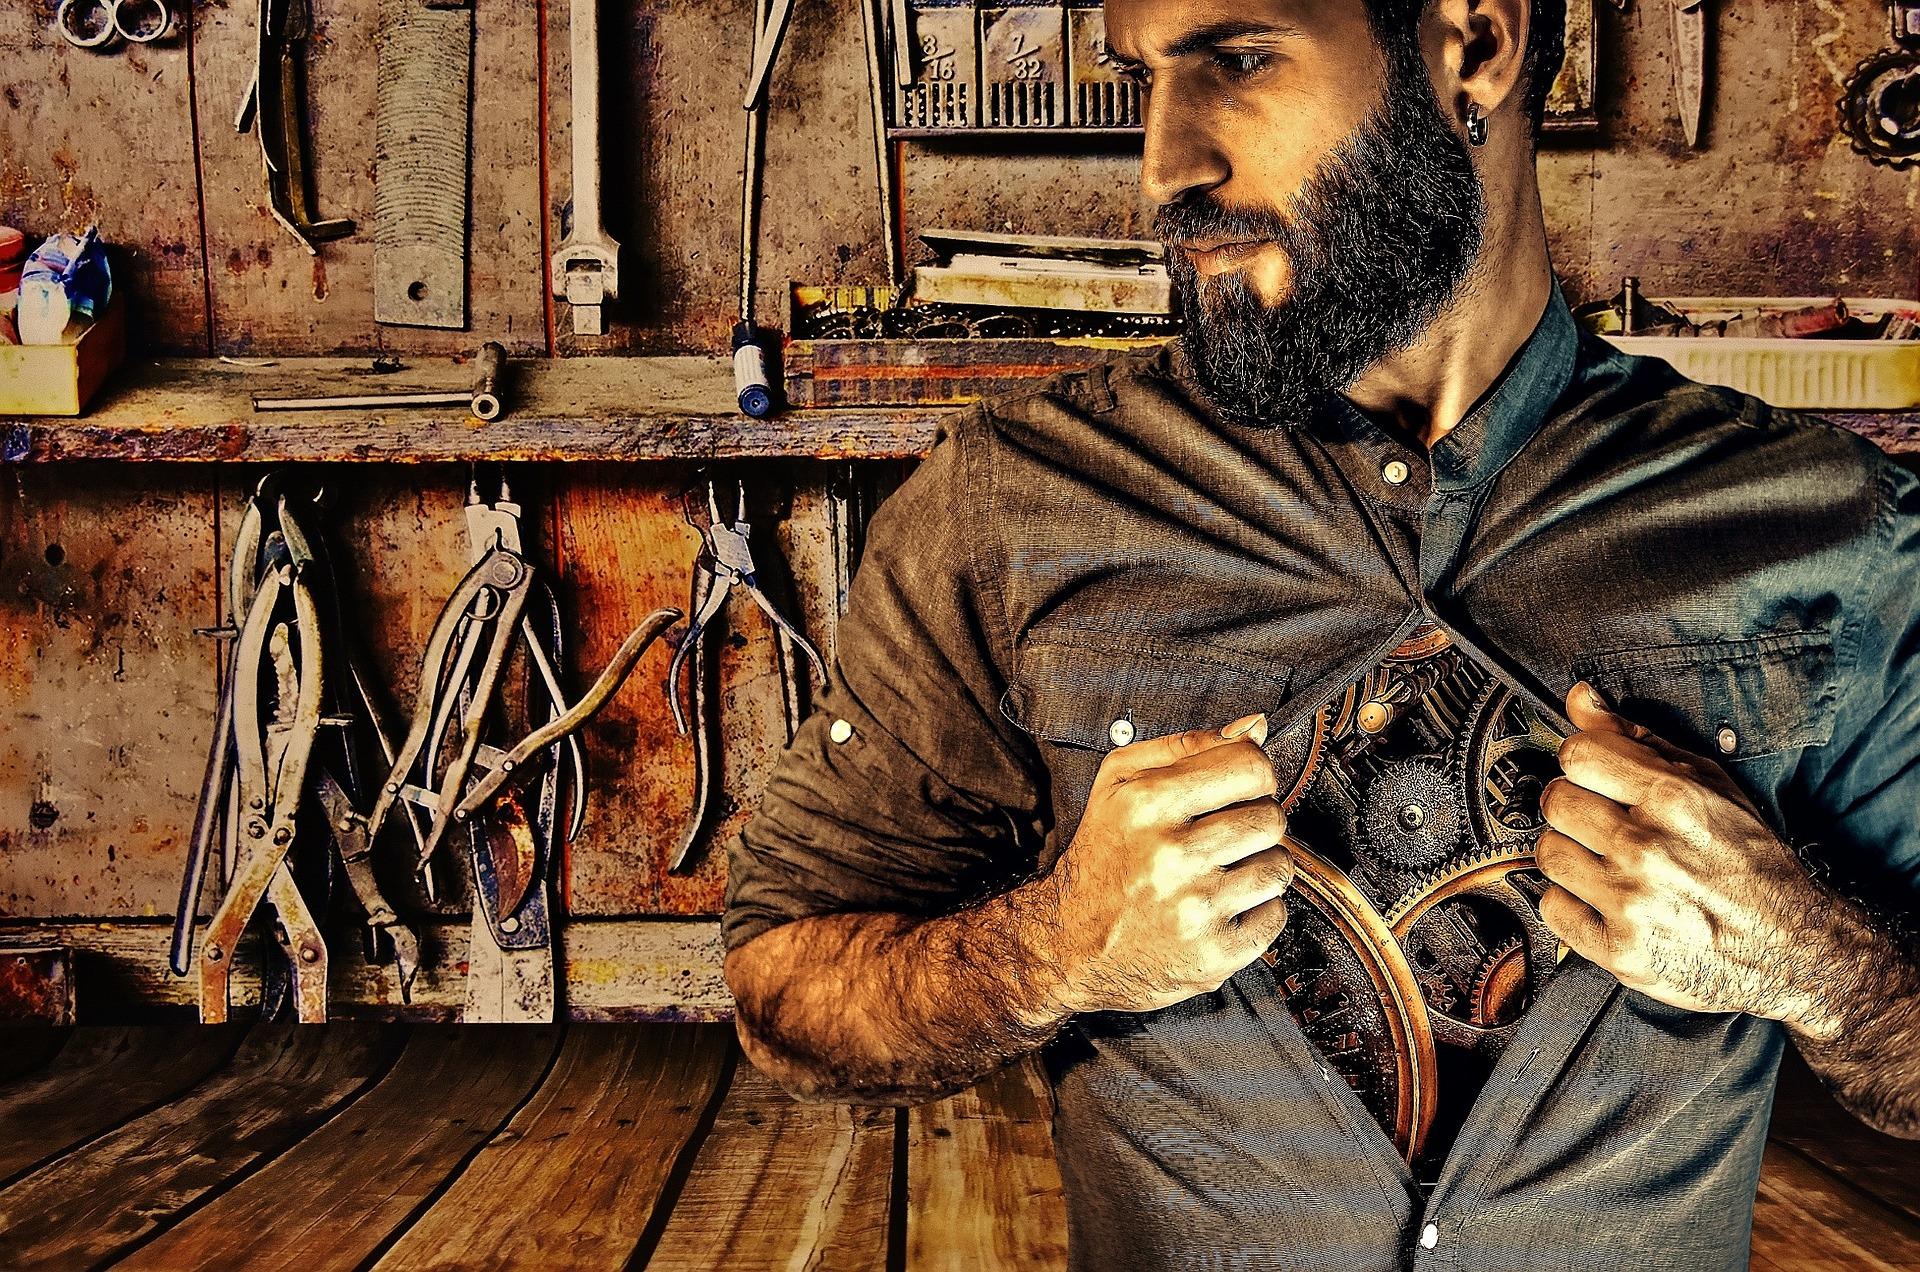 workshop-2104445_1920